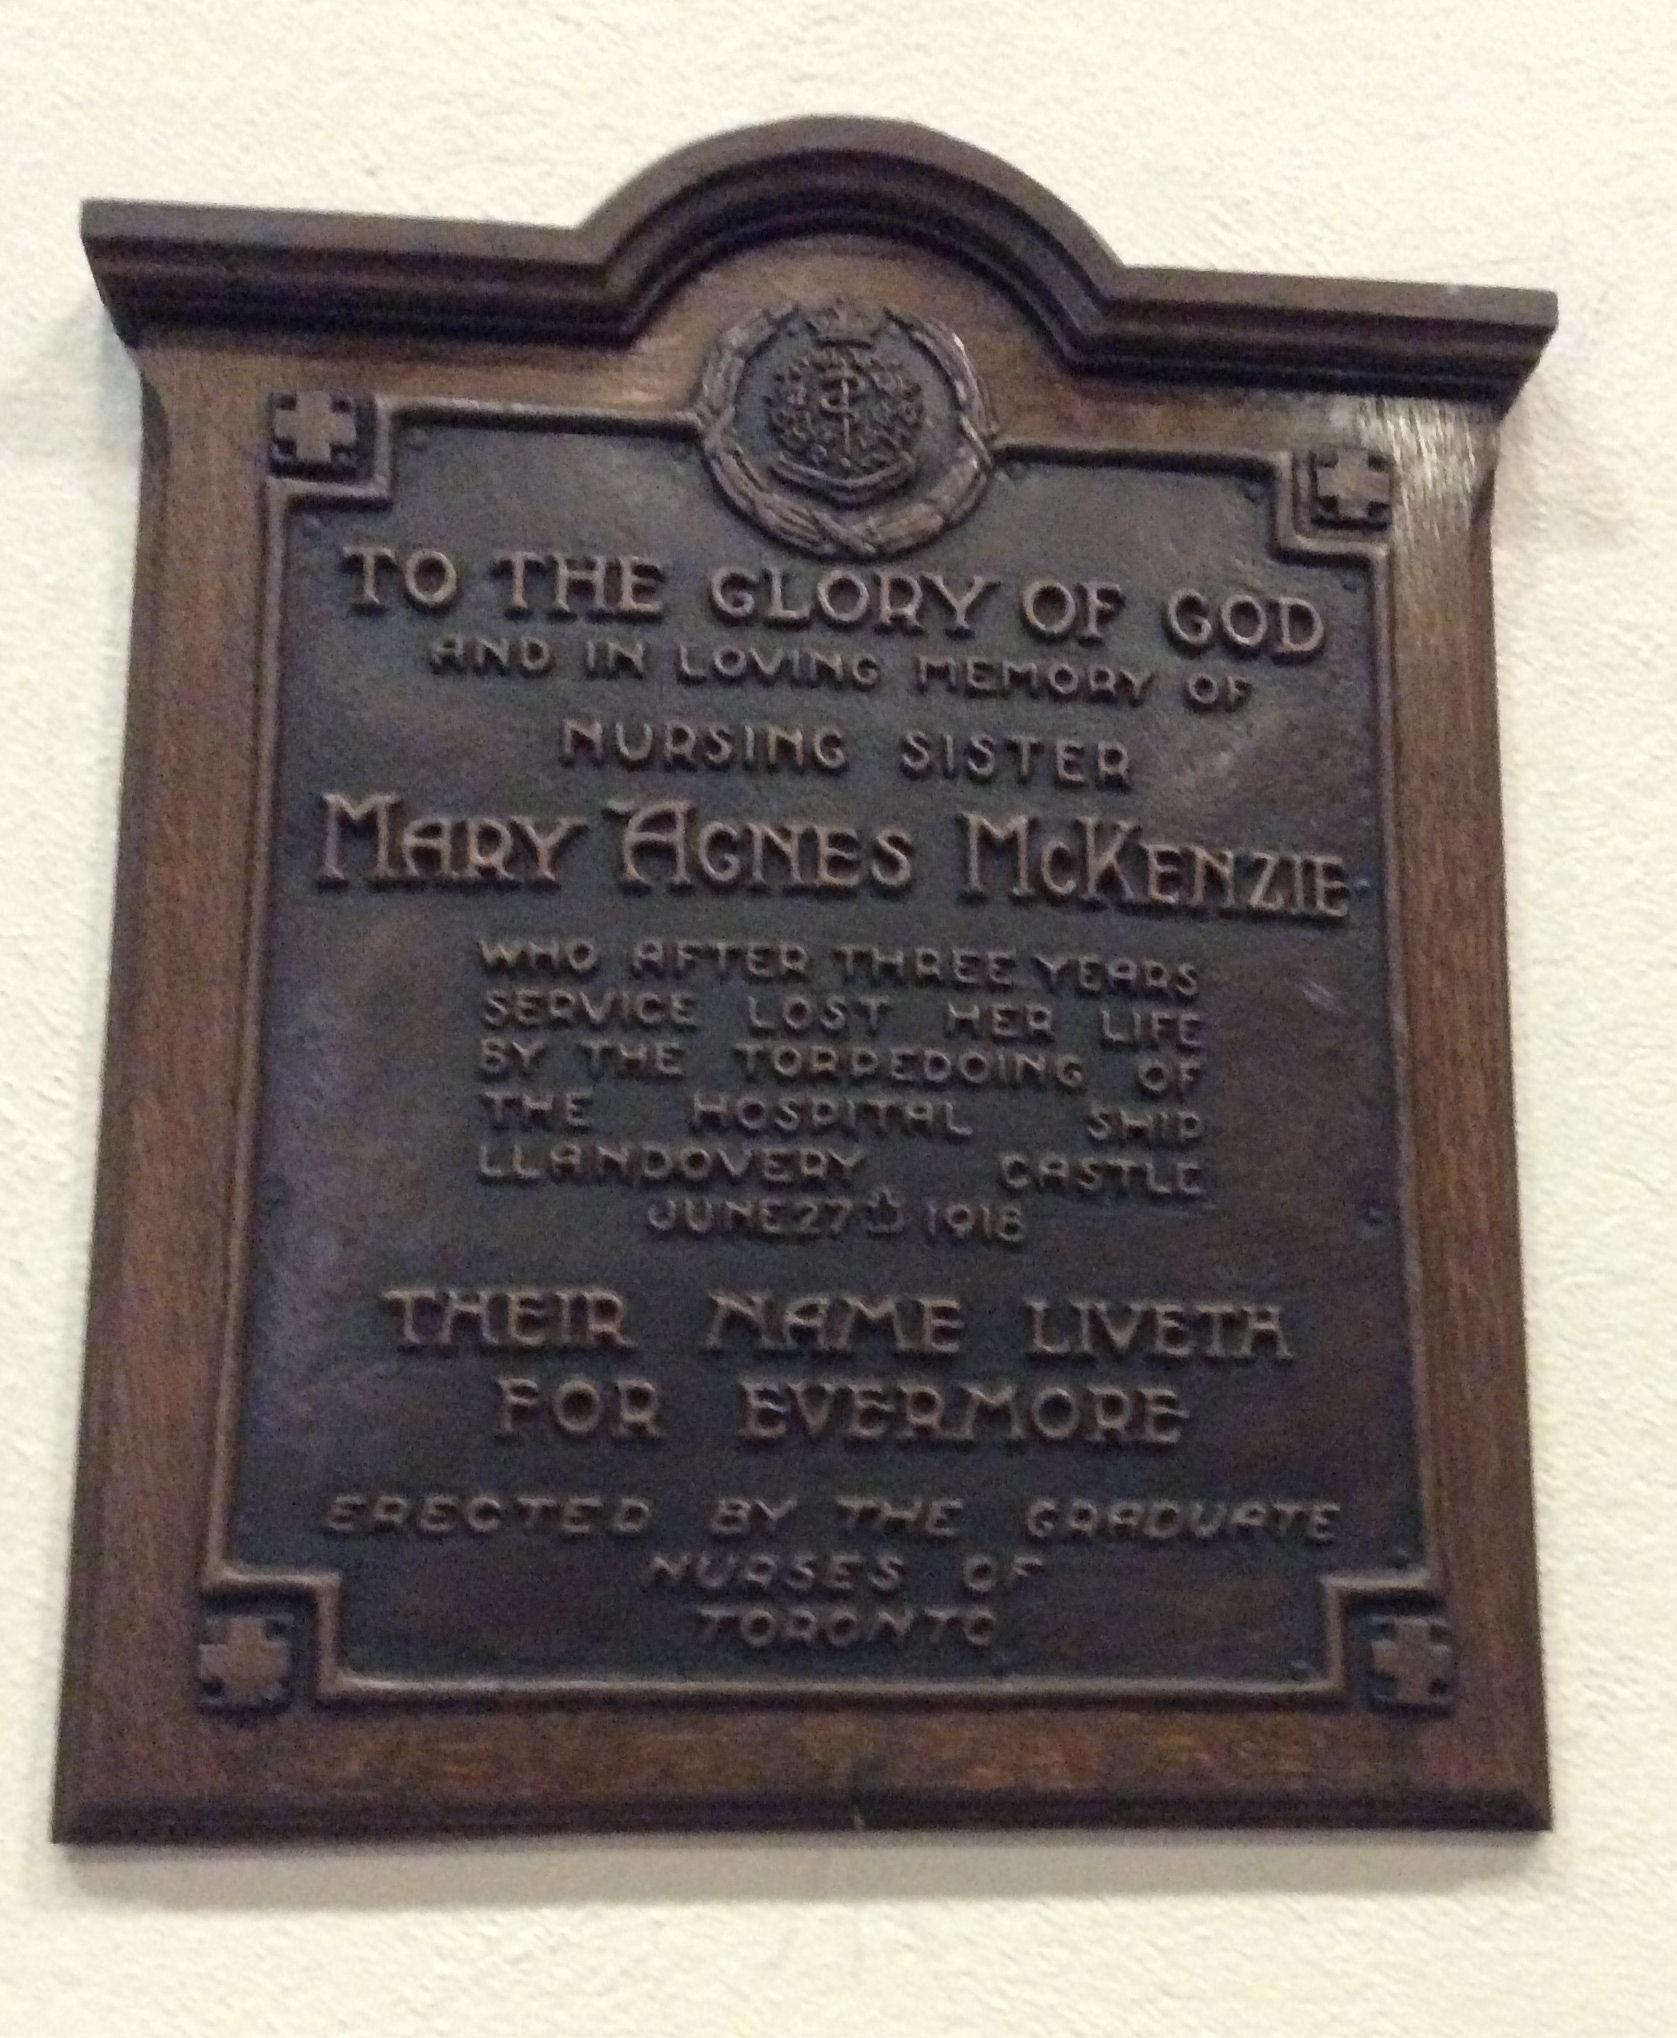 Memorial Plaque– This plaque is located in in the Calvin Presbyterian Church in Toronto, Ontario.